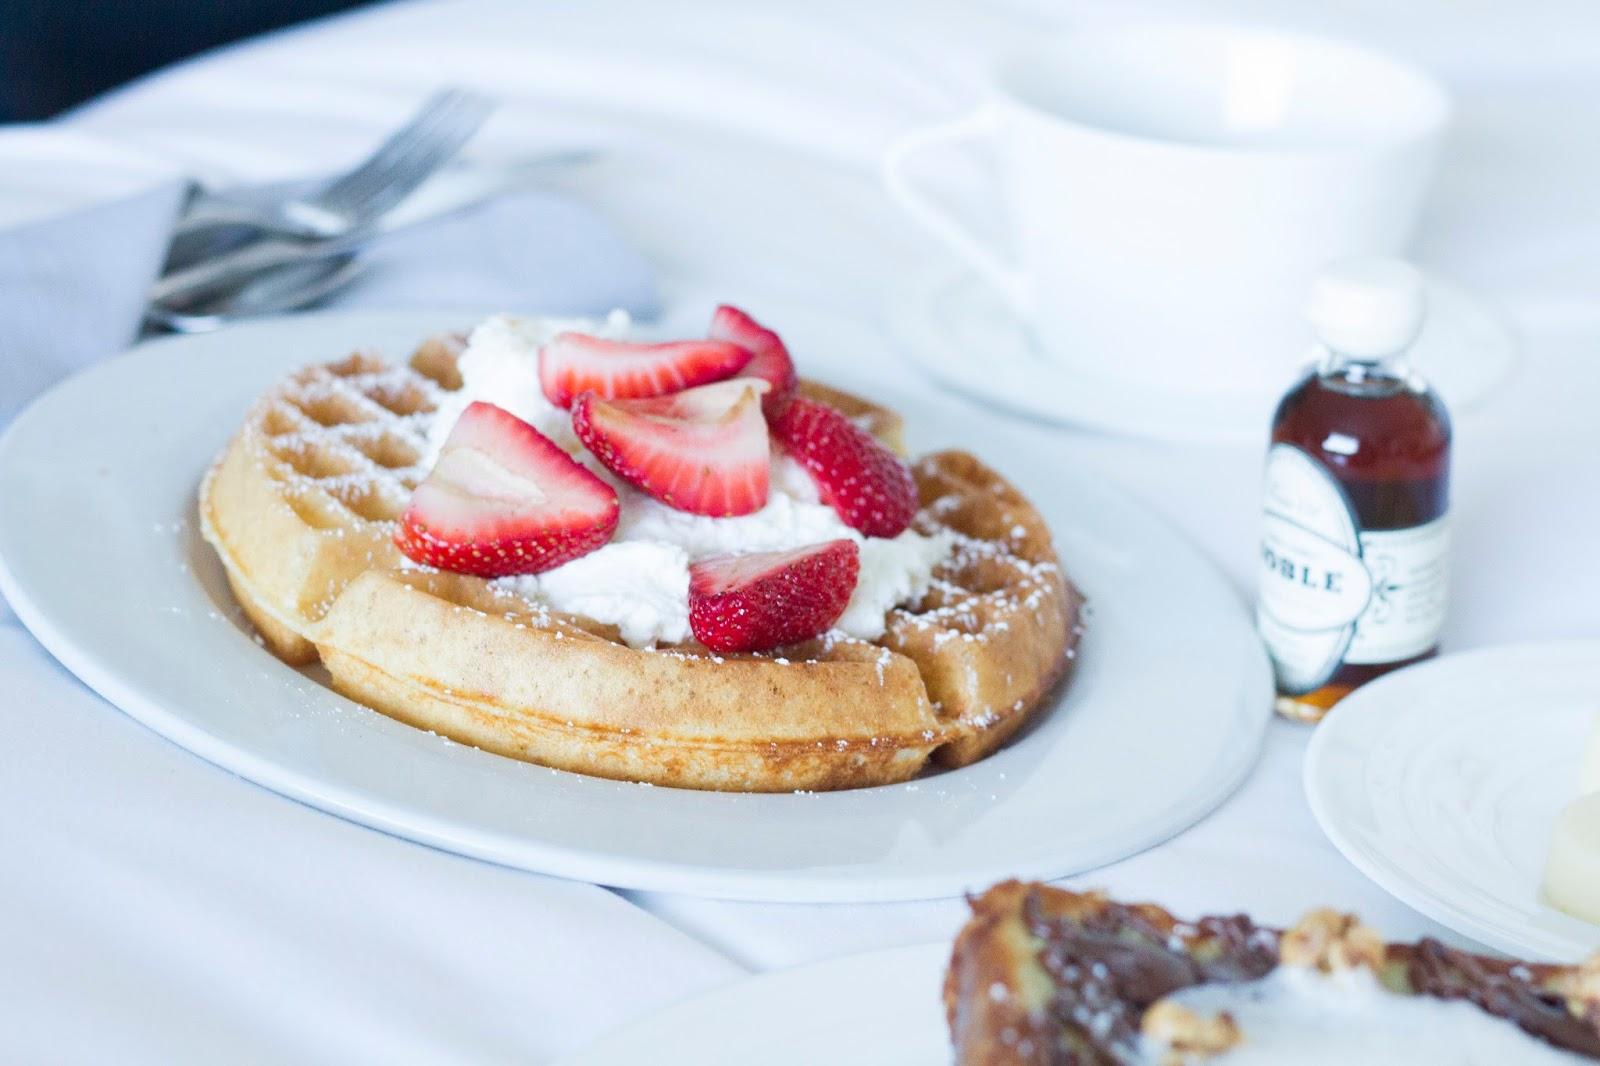 sls hotel las vegas room service breakfast